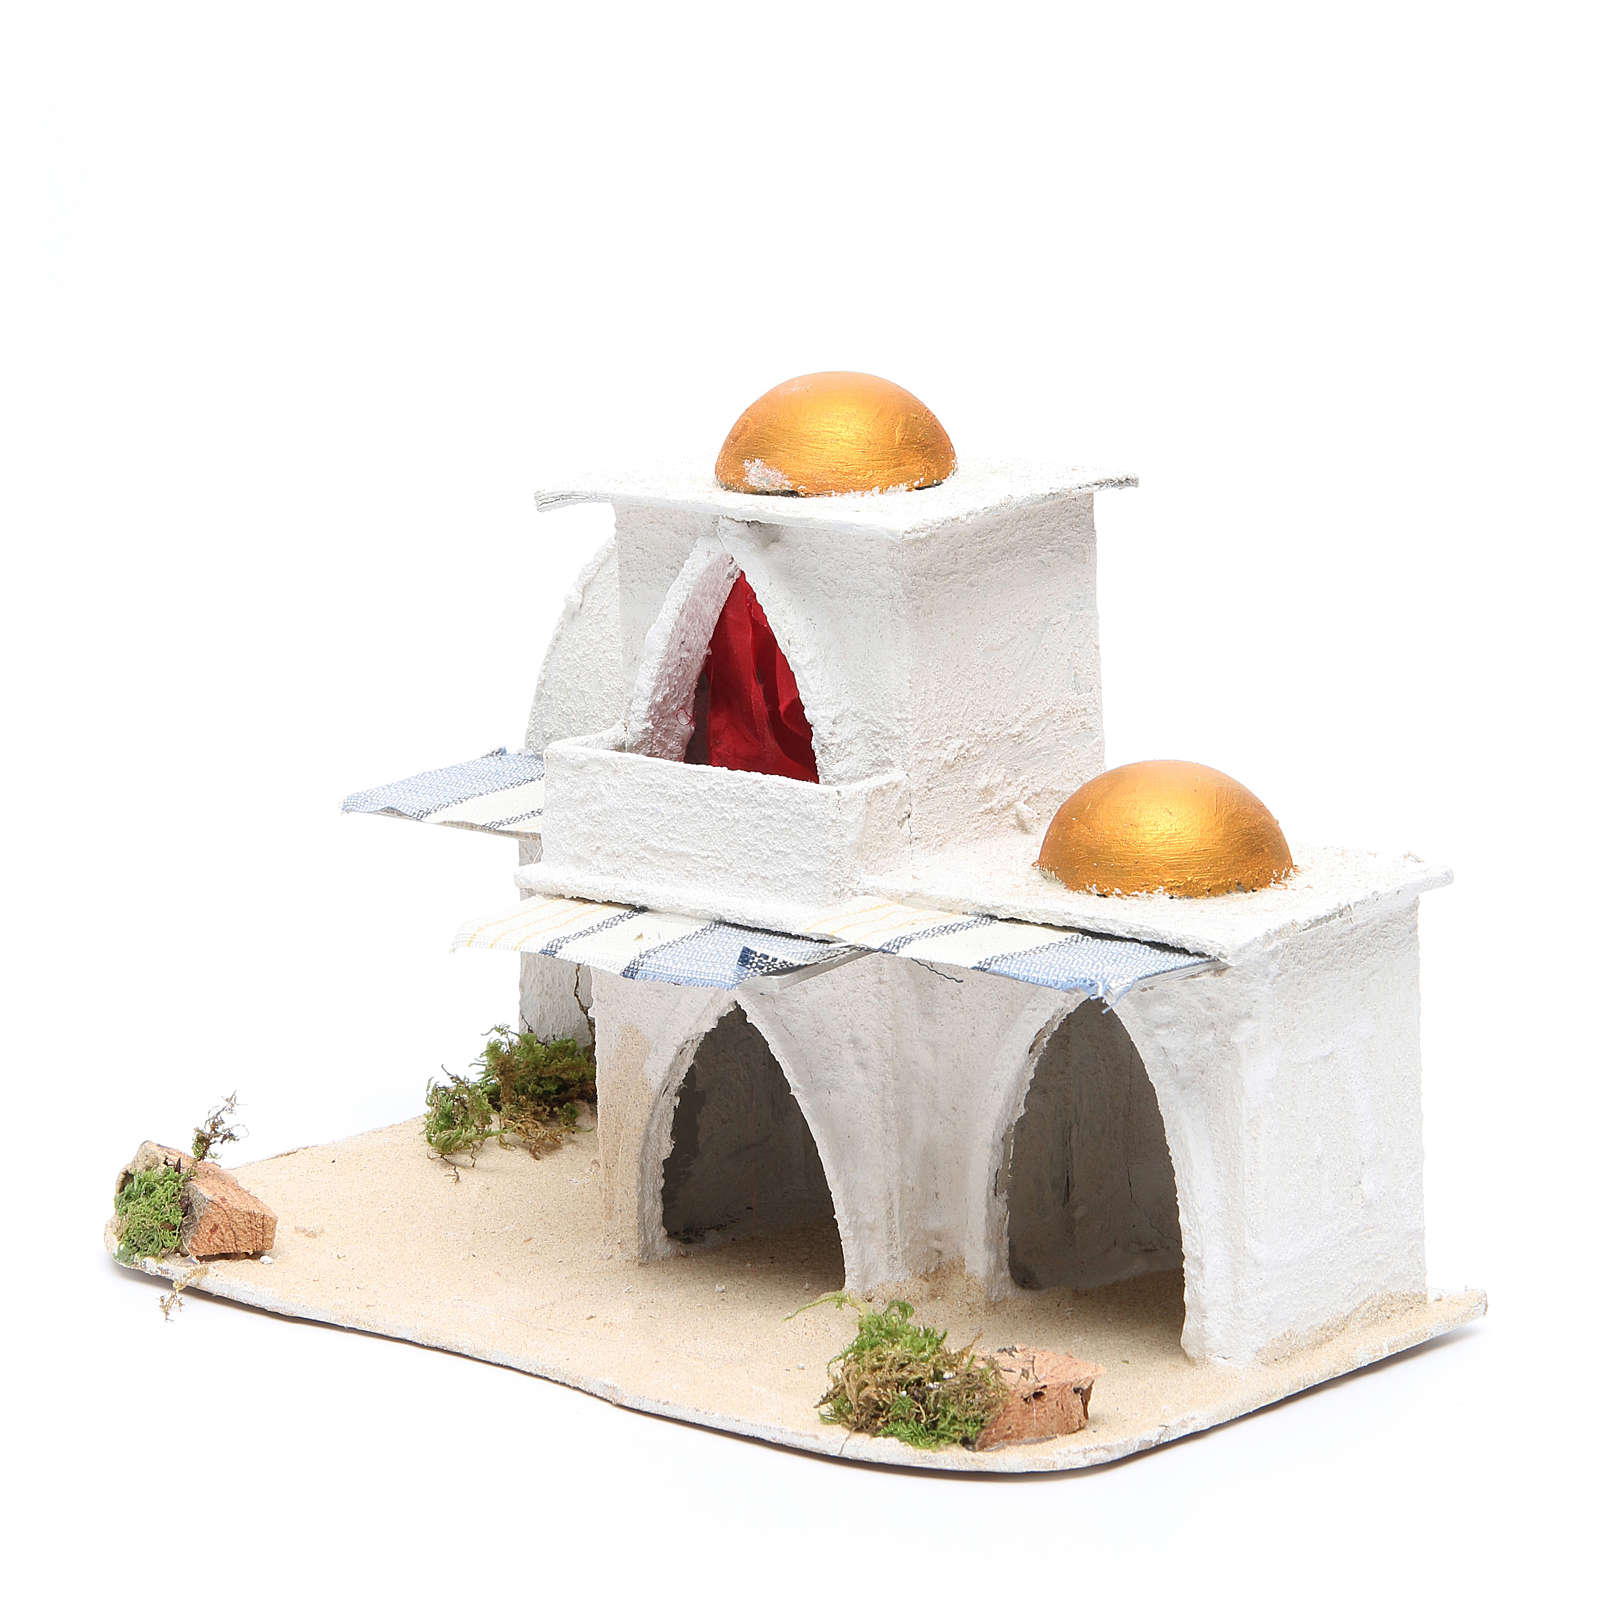 Casa araba cm 21,5x29x17 per presepe 4